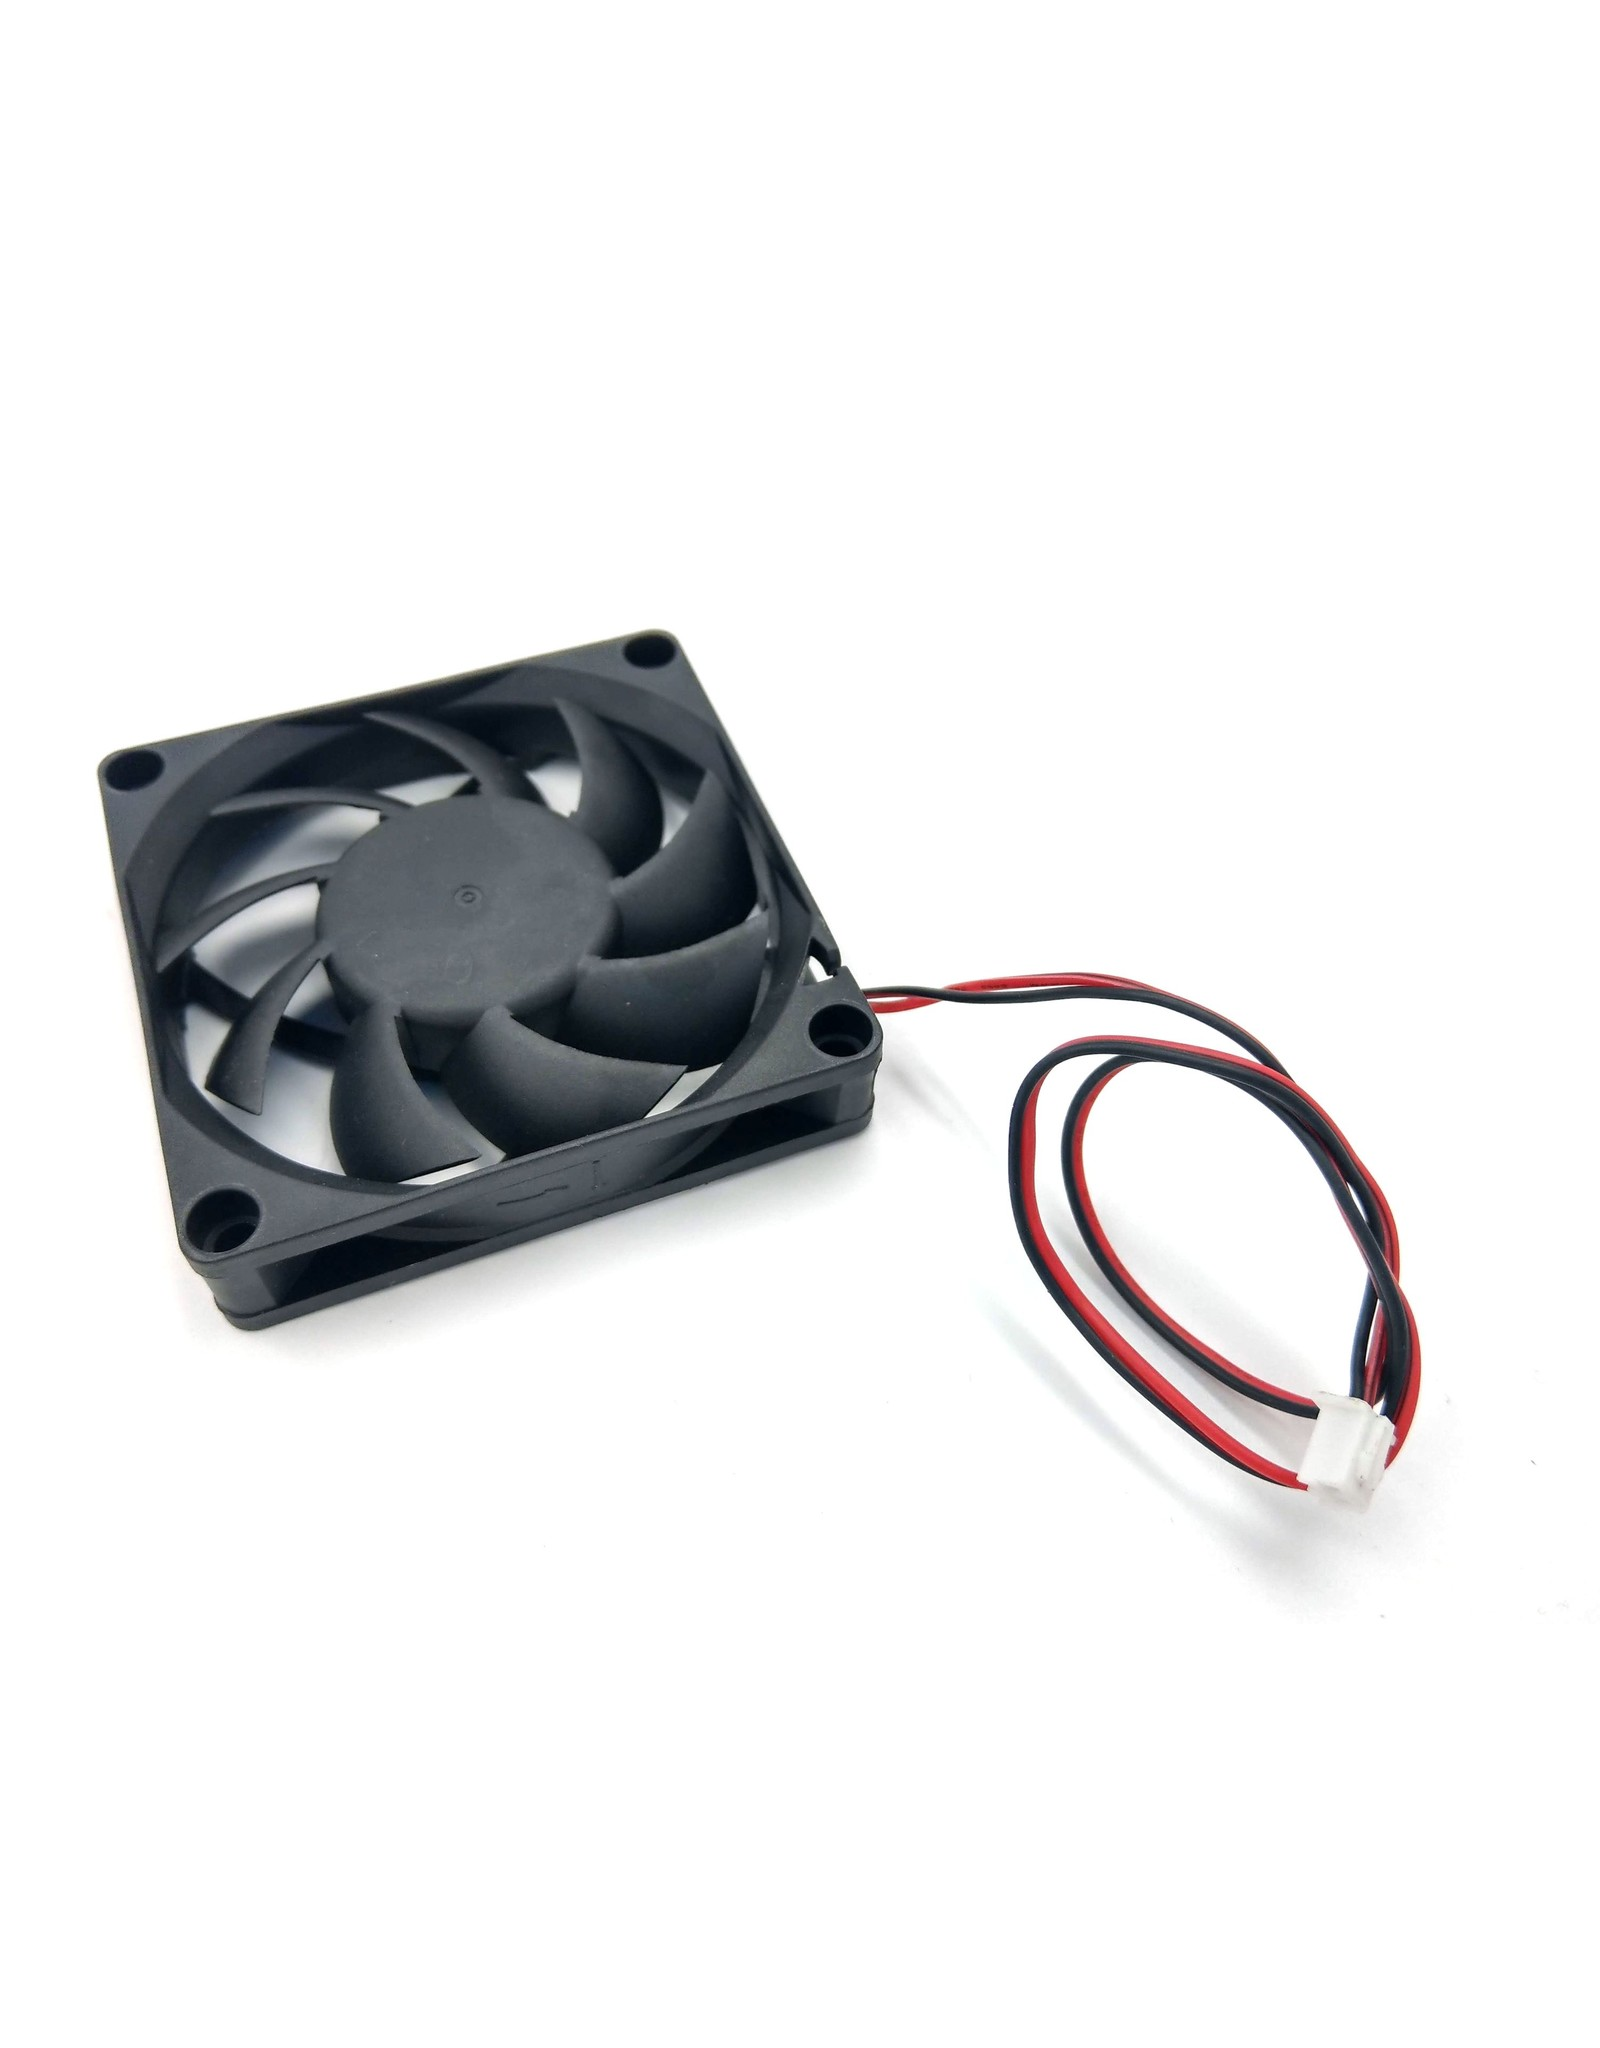 Zortrax Zortrax Bottom Fan voor M200 / M200 Plus & M300 / M300 Plus